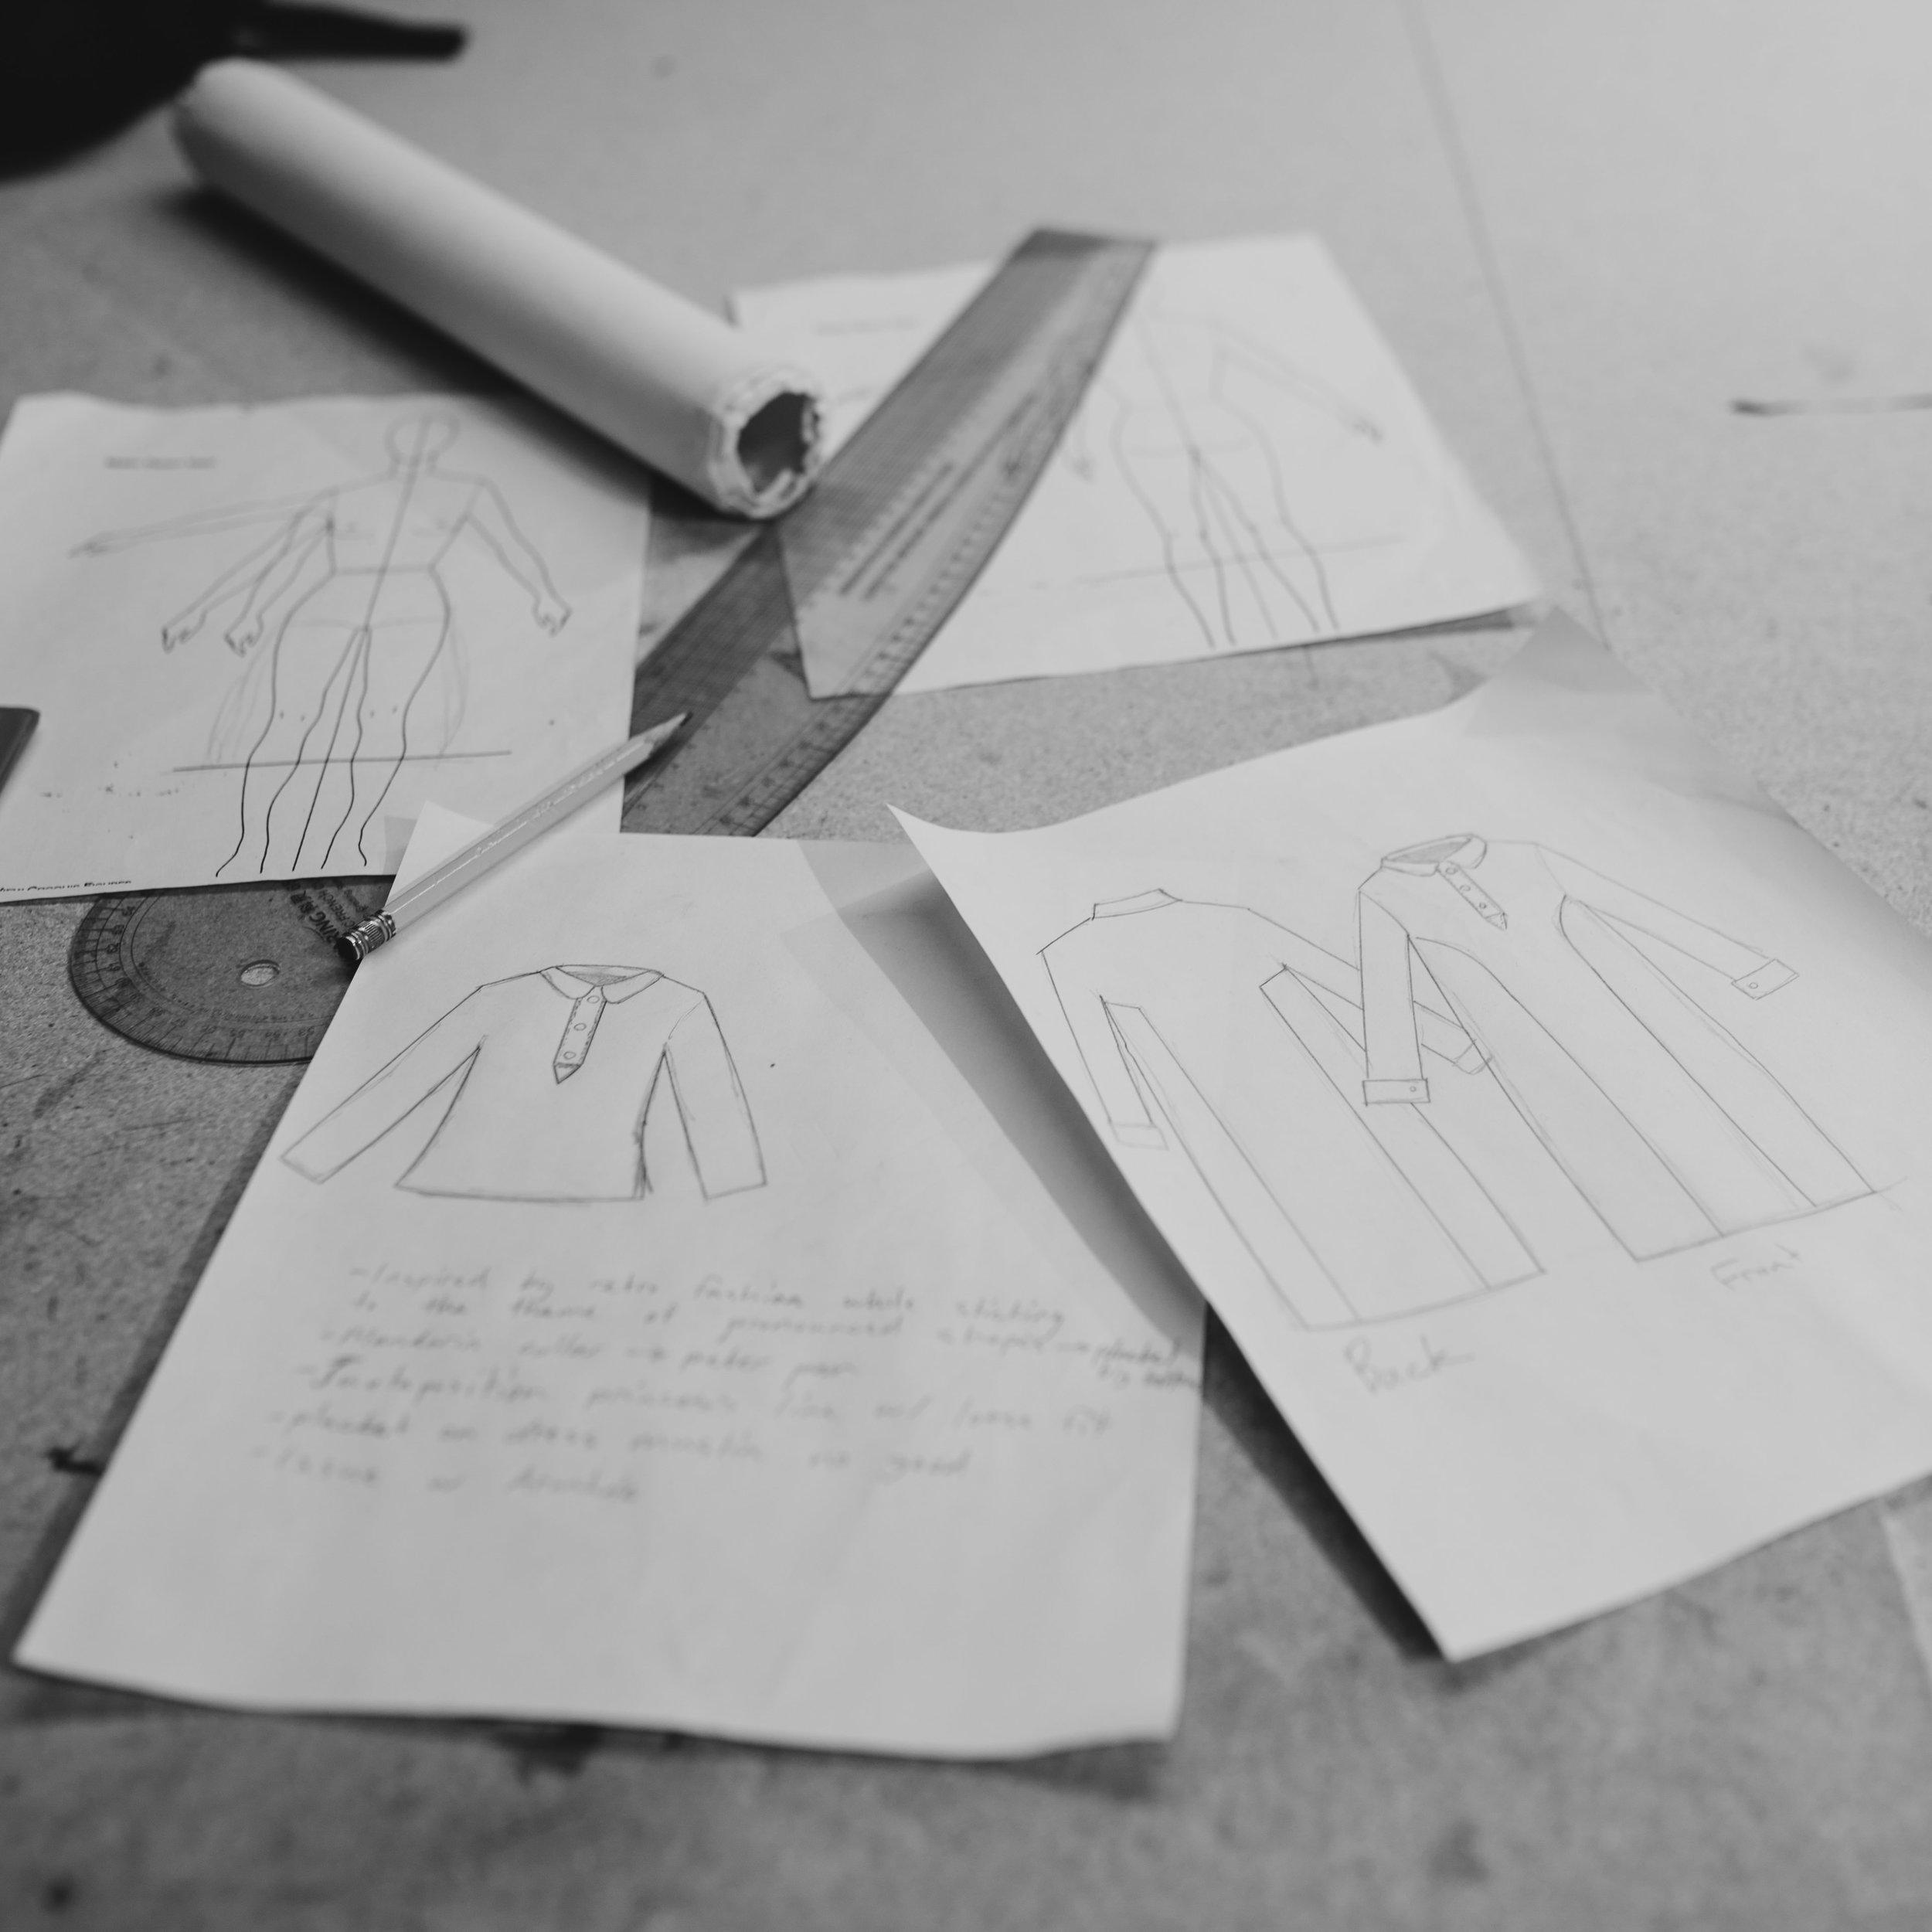 fashion-design-diploma-cutfashiondesignacademy